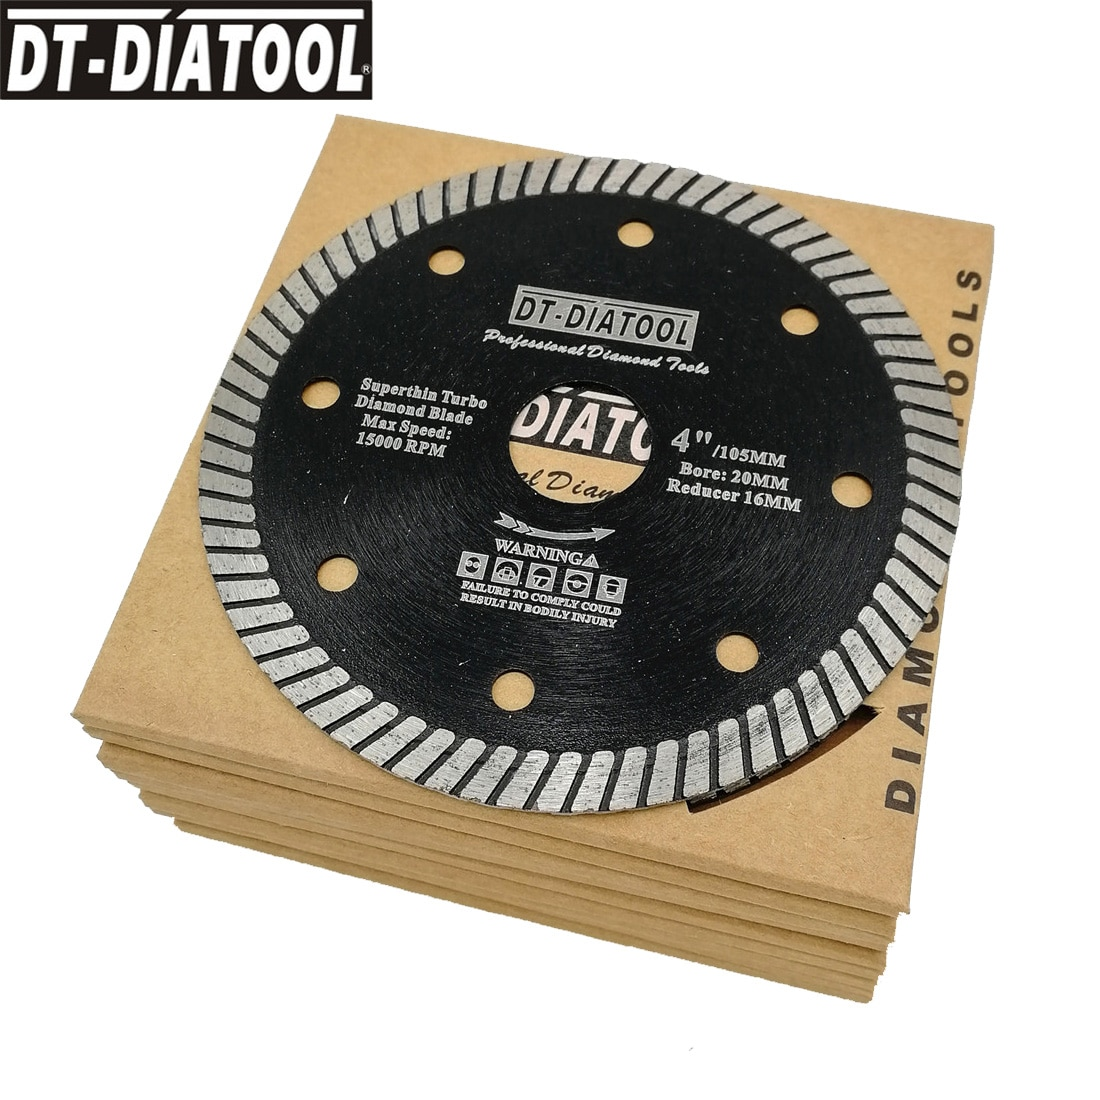 DT-DIATOOL 10pcs/pk Diamond Super Thin Saw Blades Dry or Wet Cutting Disc For Ceramic Tile Granite bore 20mm  Dia 105mm